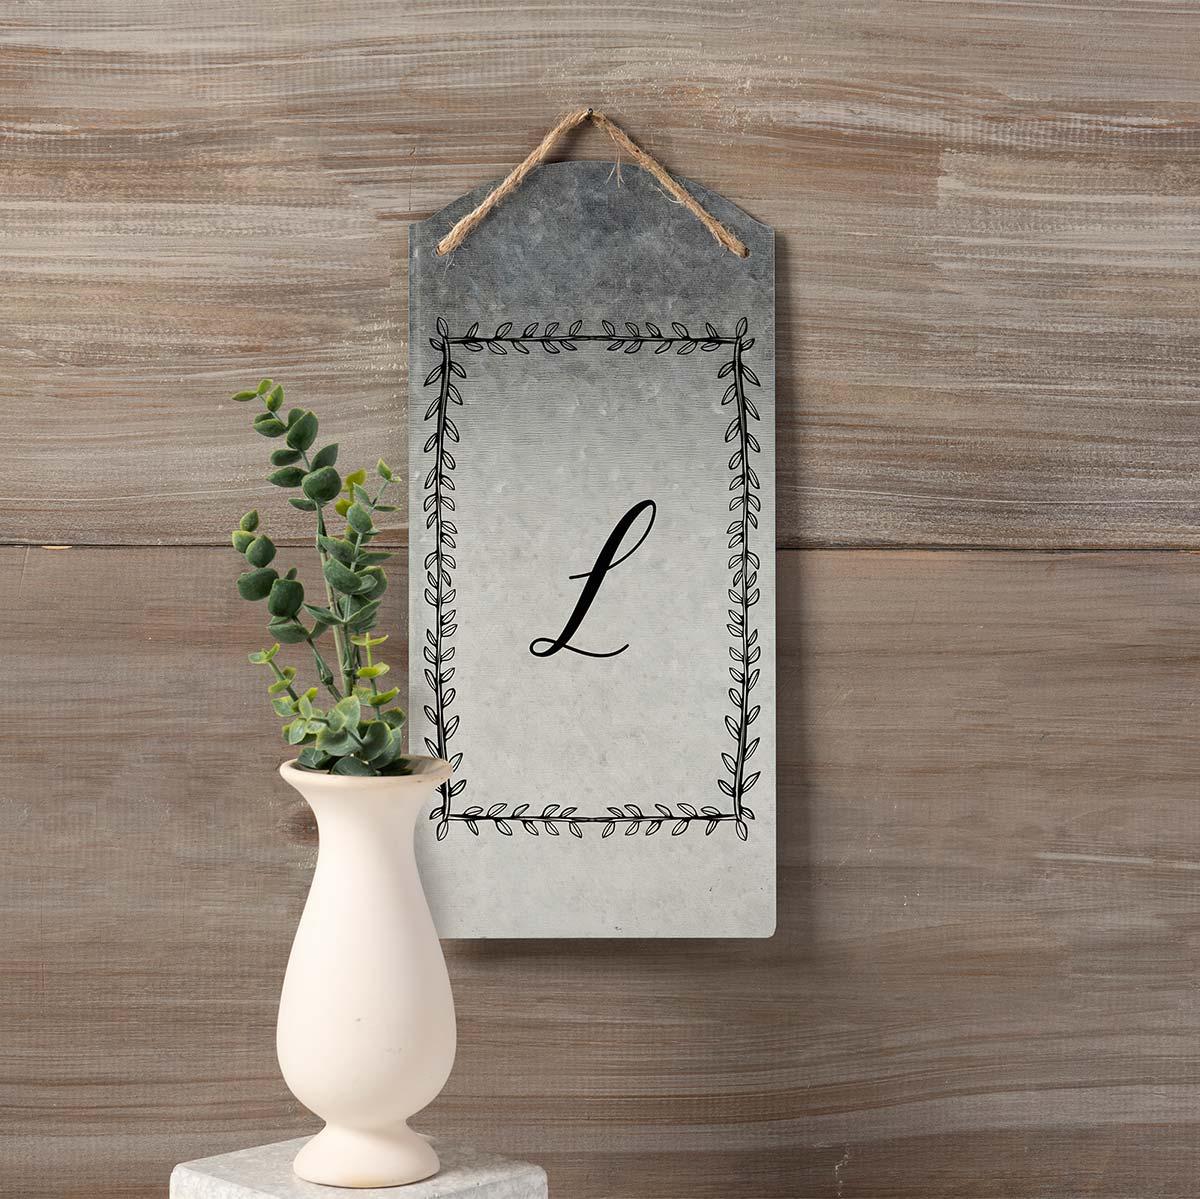 FolkArt ® Sign Shop™ Mesh Stencil - Rectangular Wreath, 2 pc. - 63358